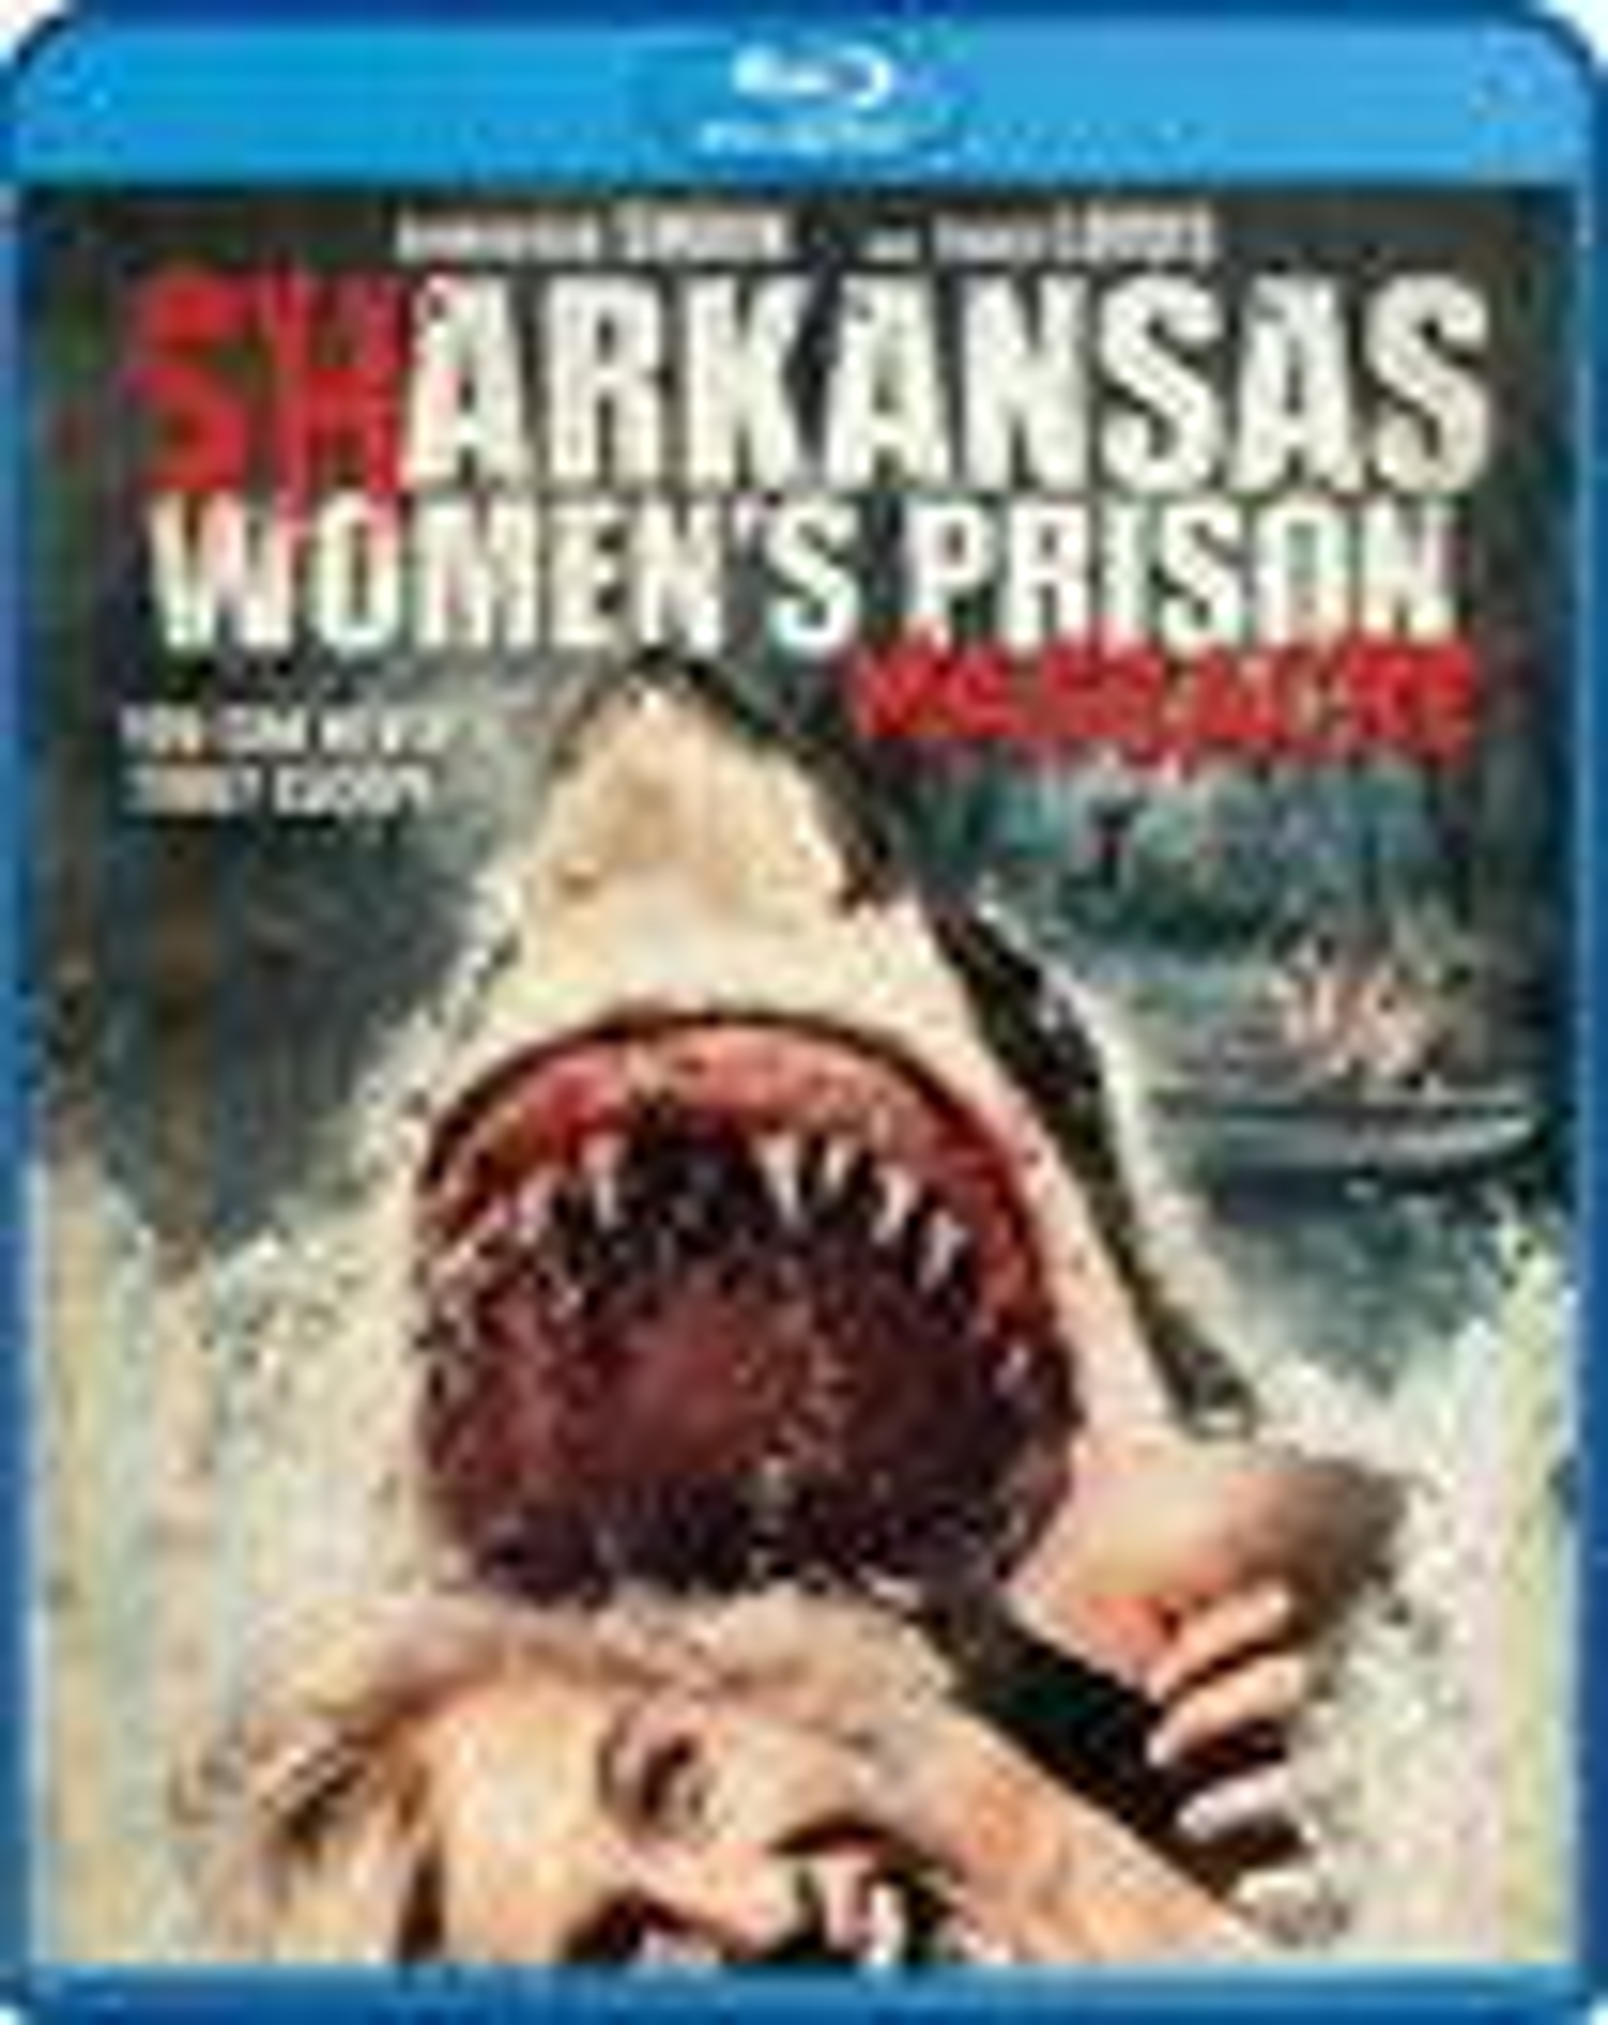 Sharkansas Women's Prison Massacre [blu-ray] 5015900